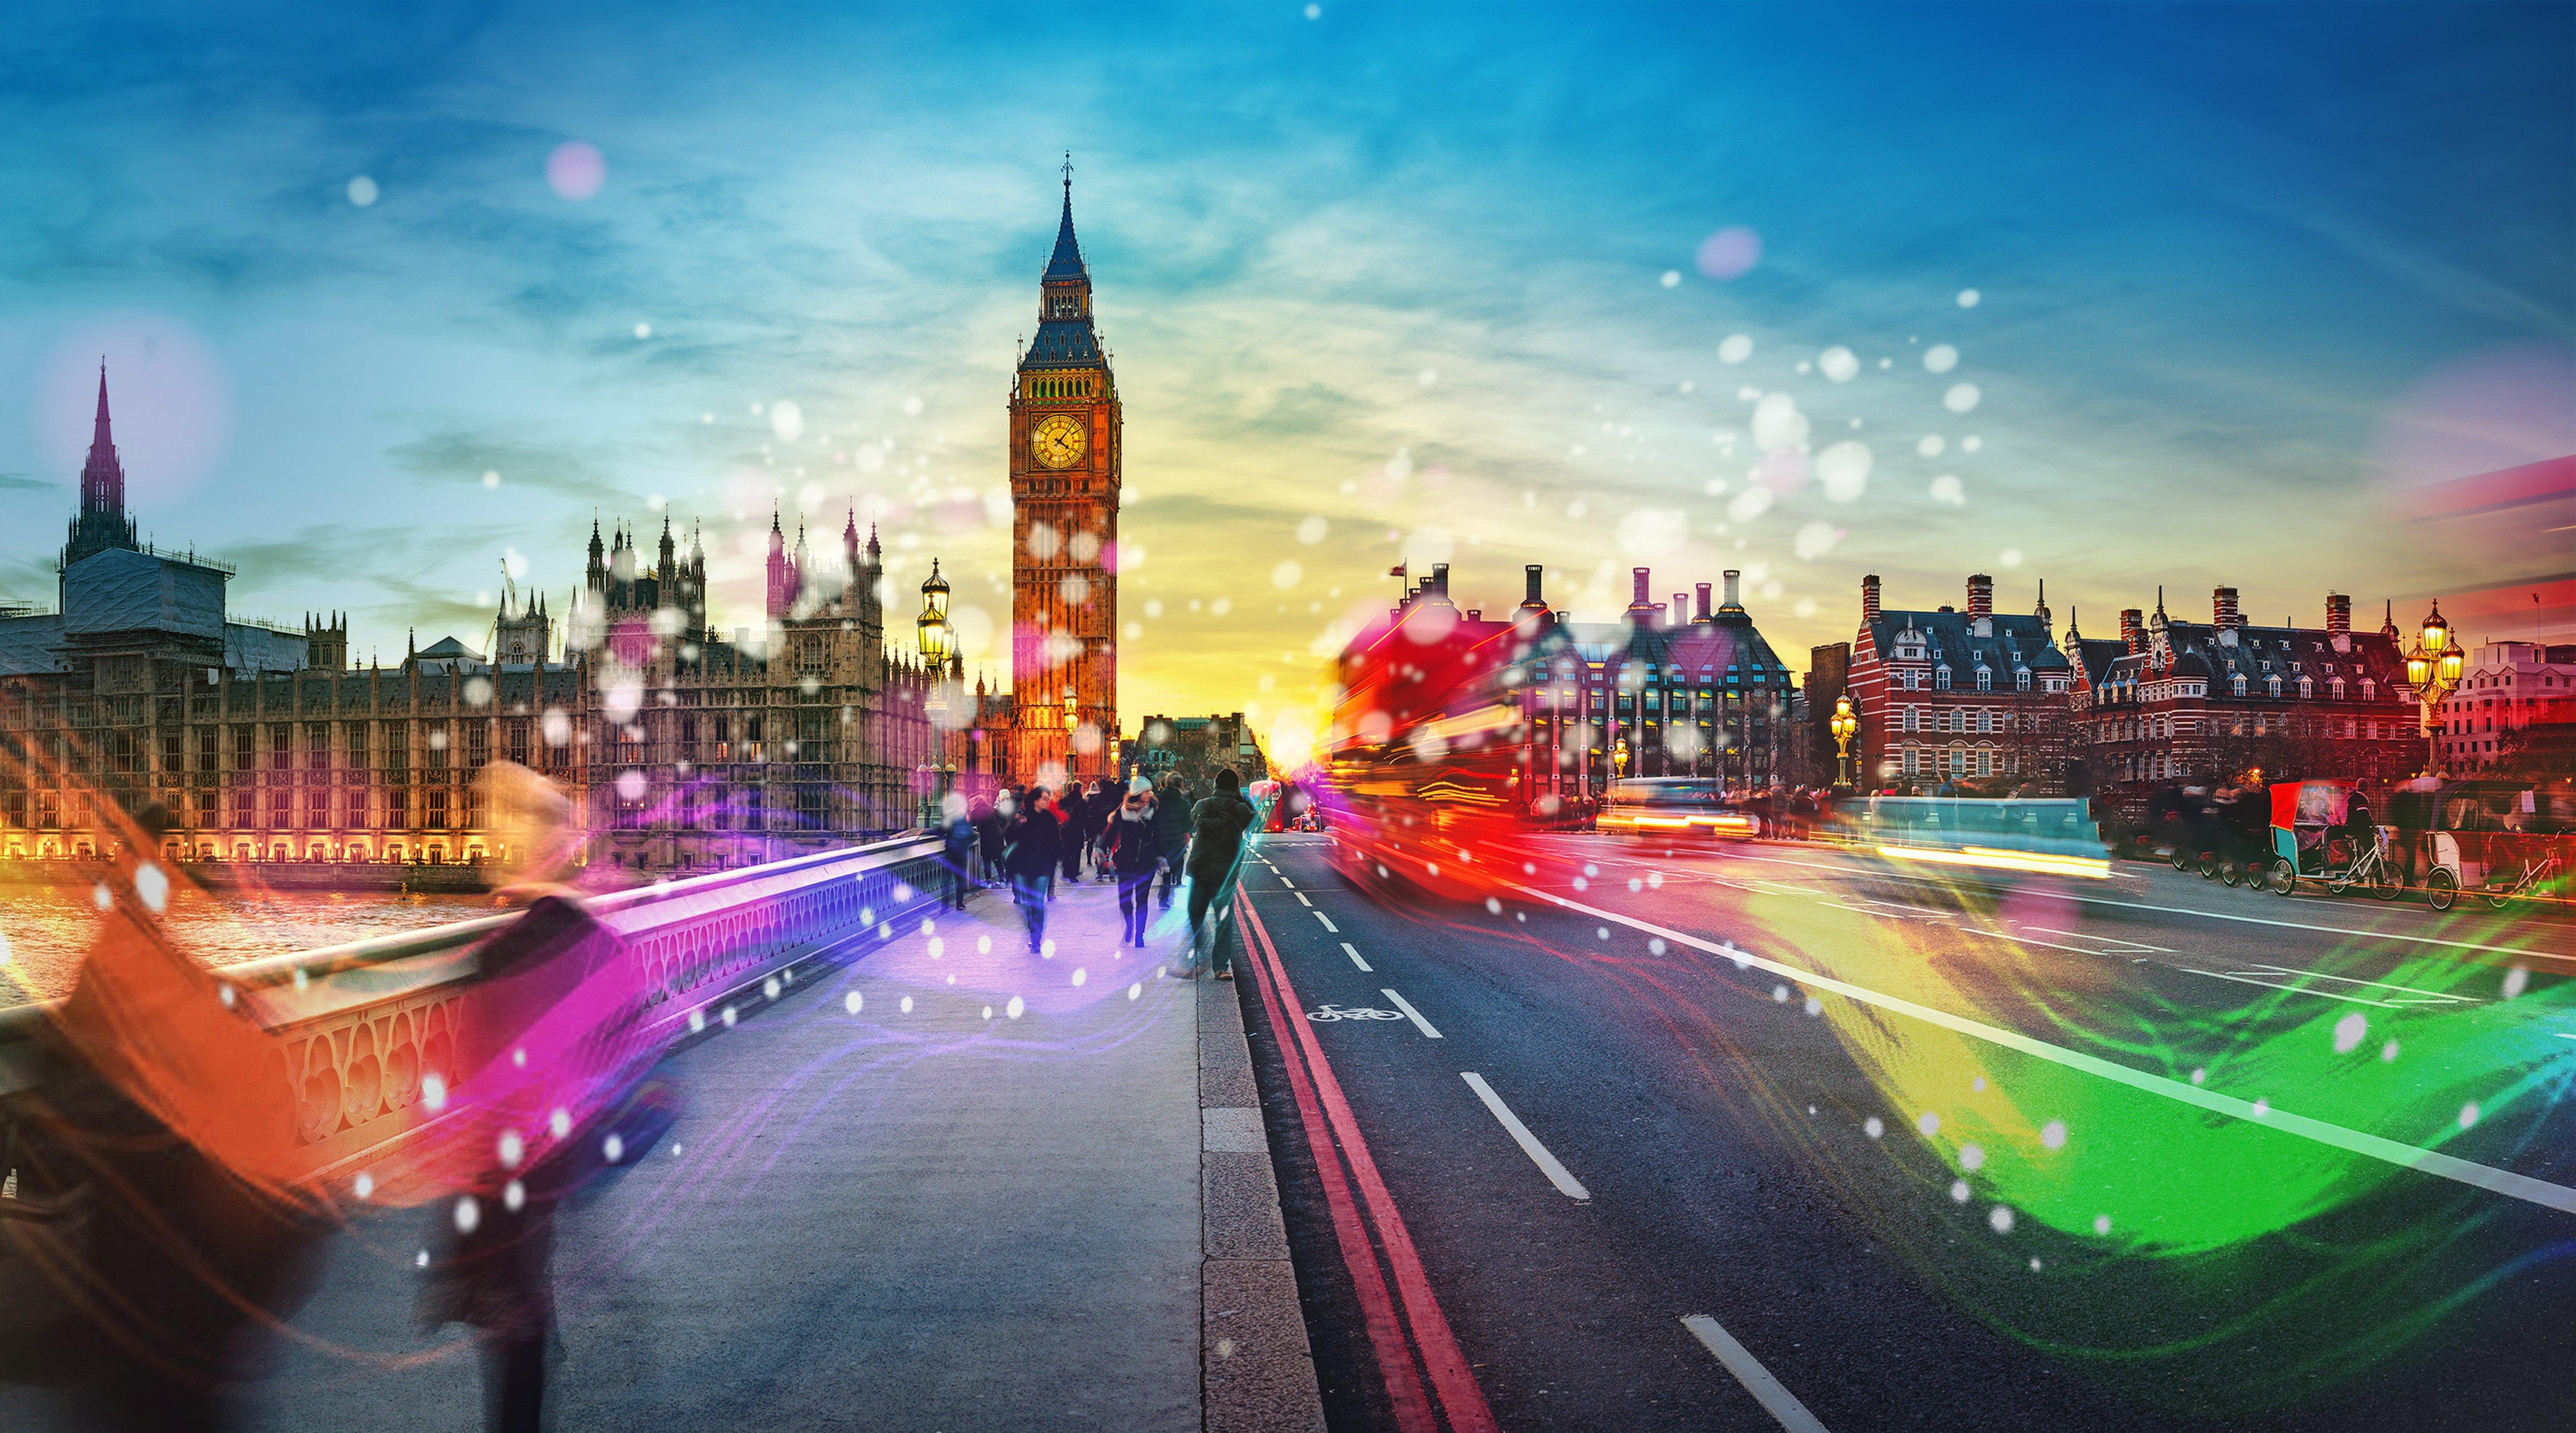 London Big Ben Landscape